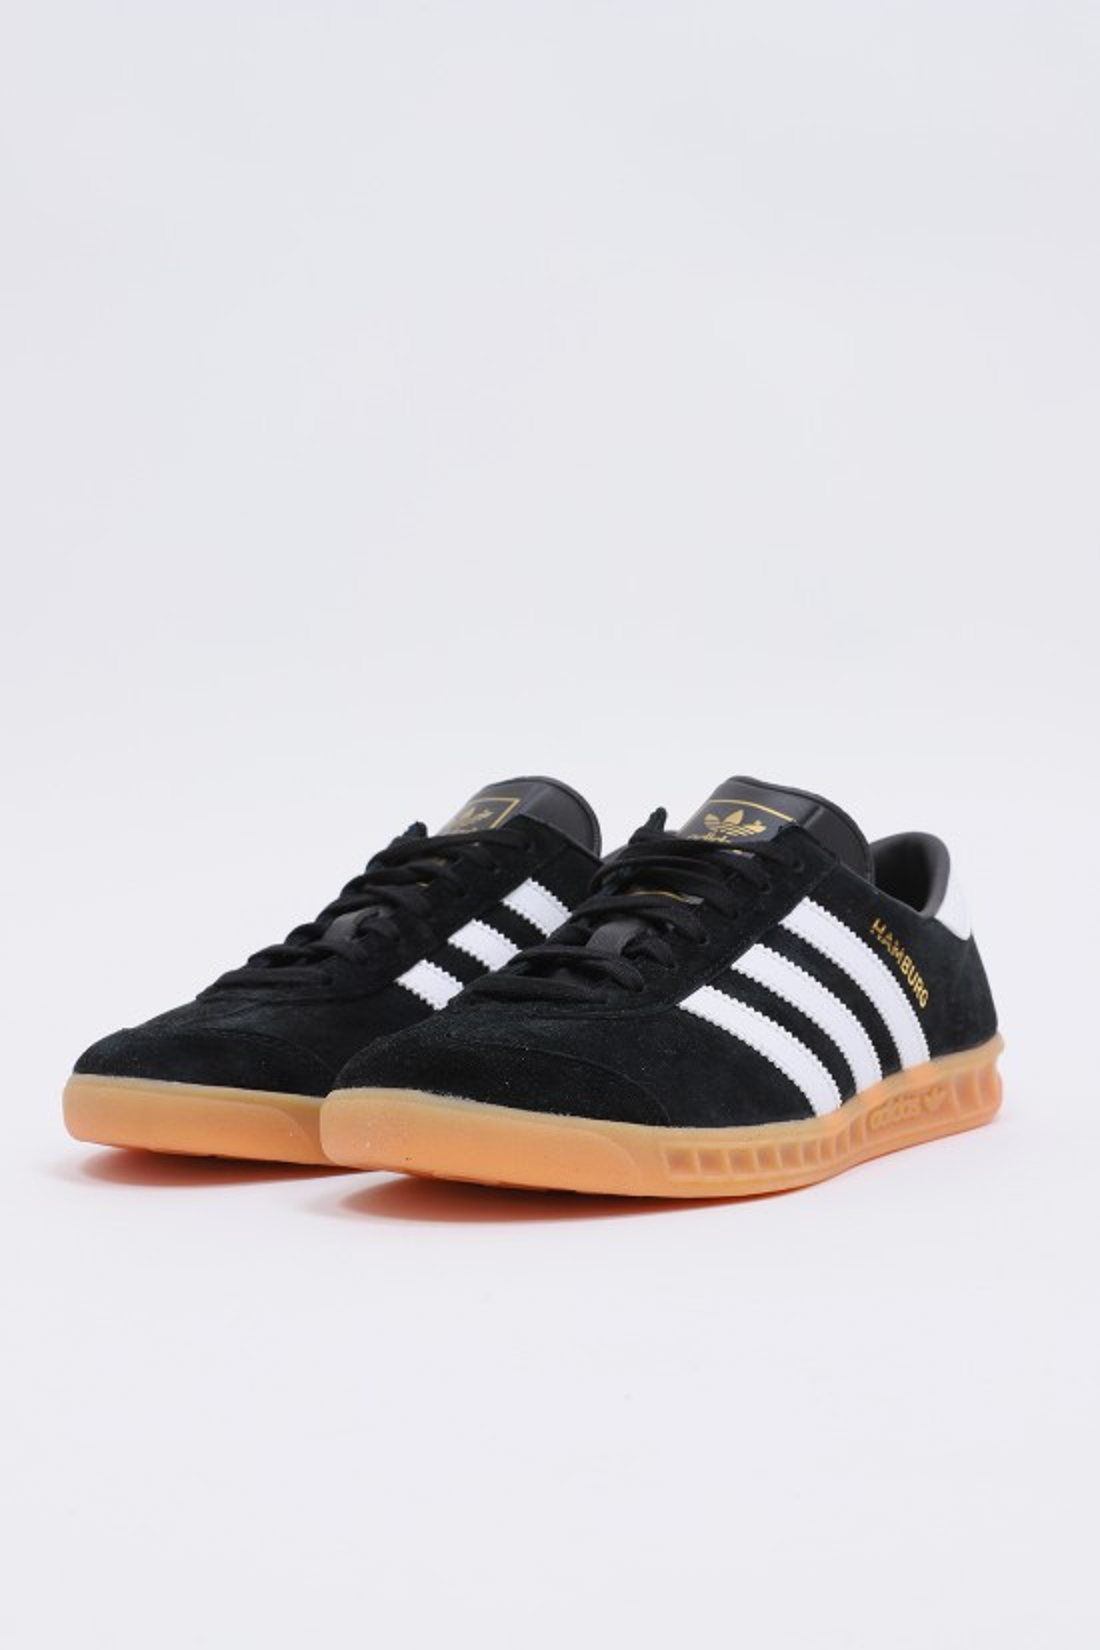 ADIDAS / Hamburg Core black / gum